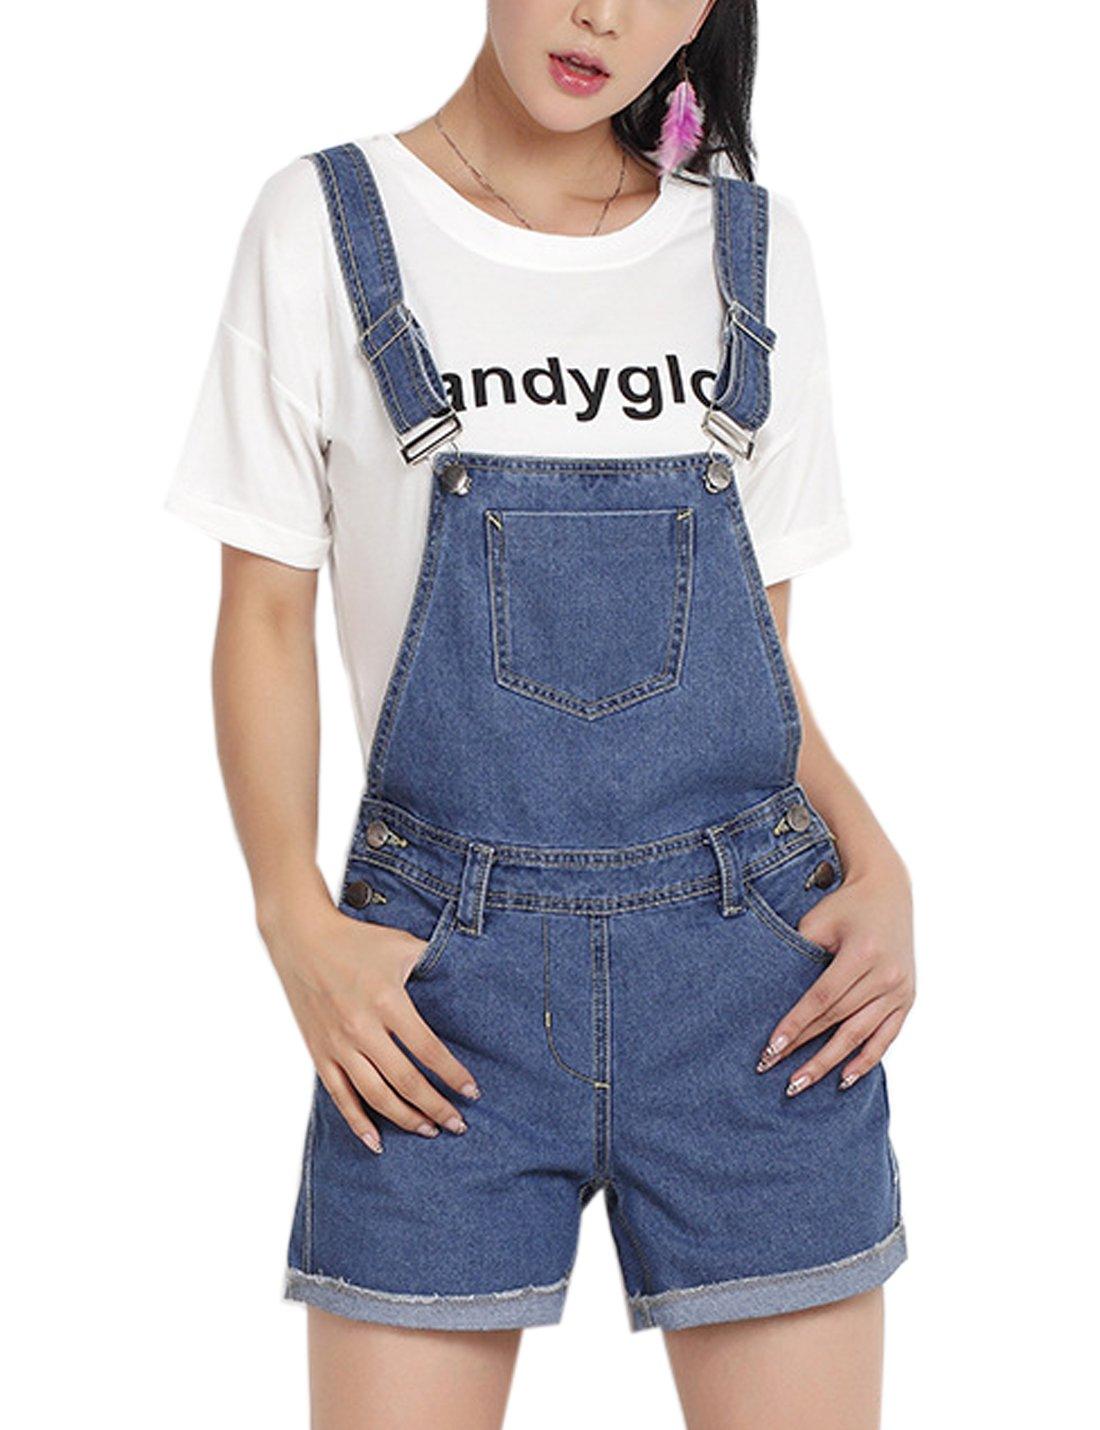 Flygo Women's Classic Casual Distressed Denim Bib Overalls Shorts (X-Large, Blue)